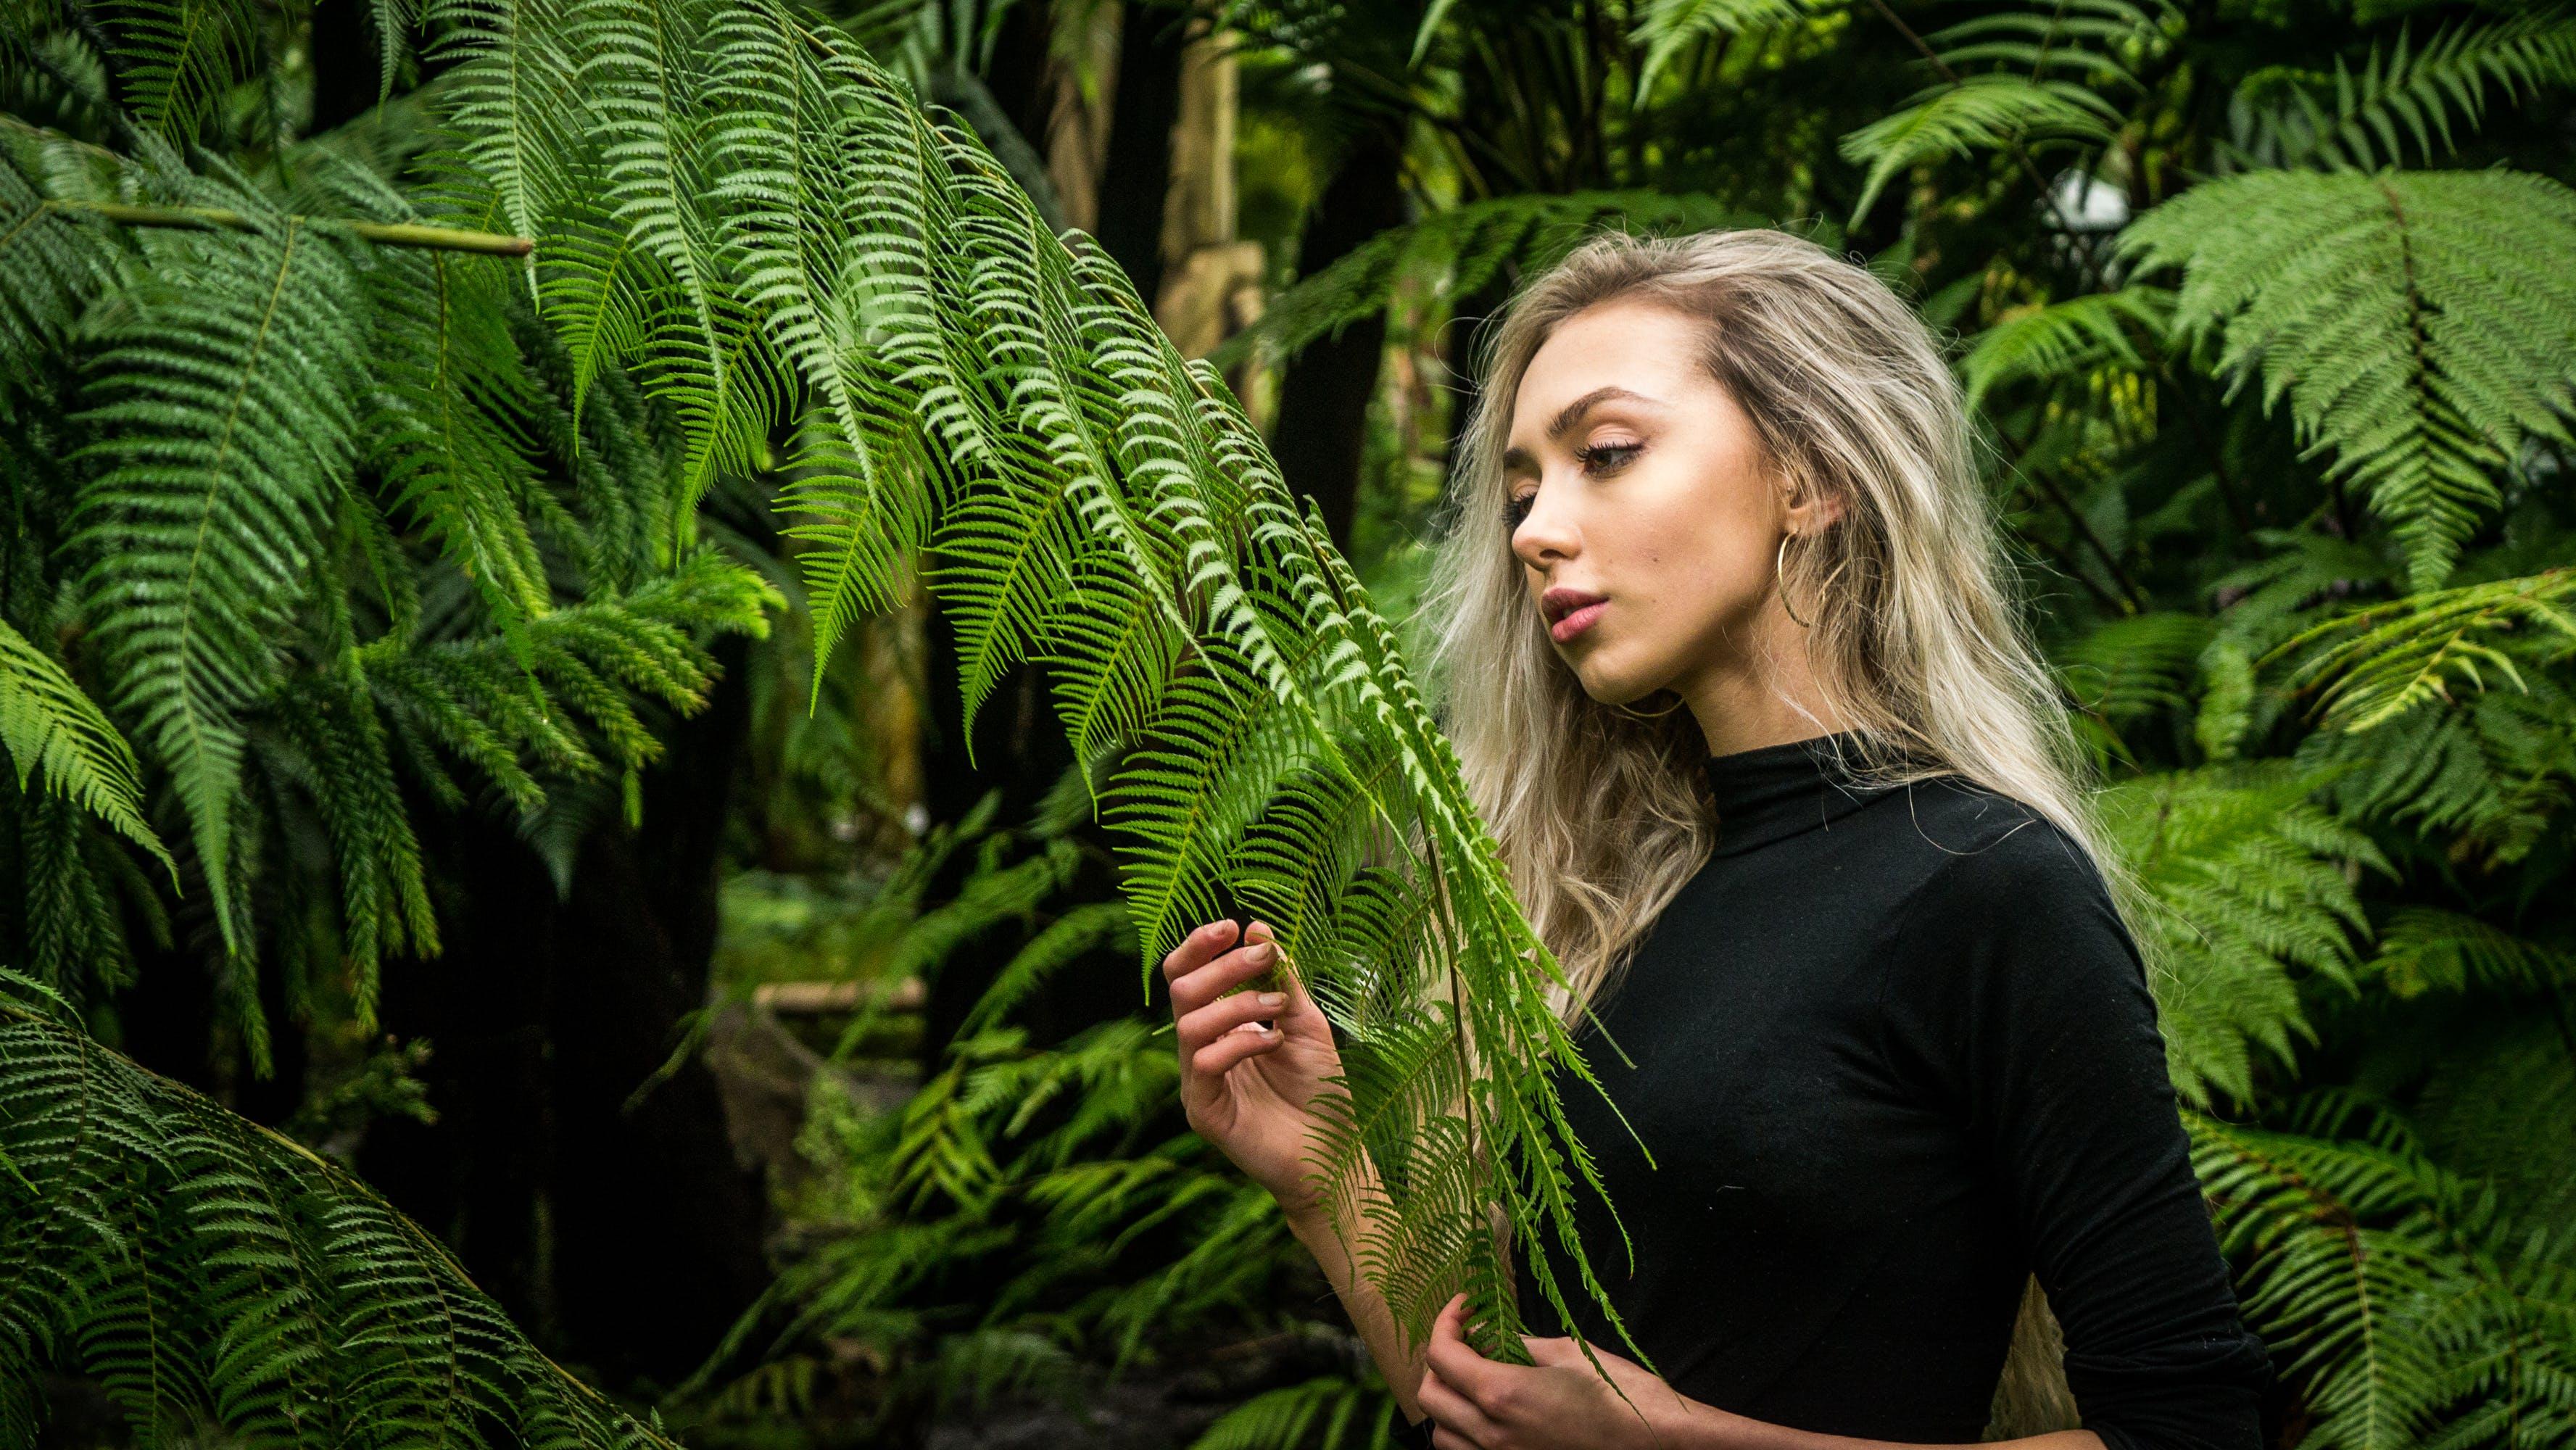 Photo of Girl Holding Fern